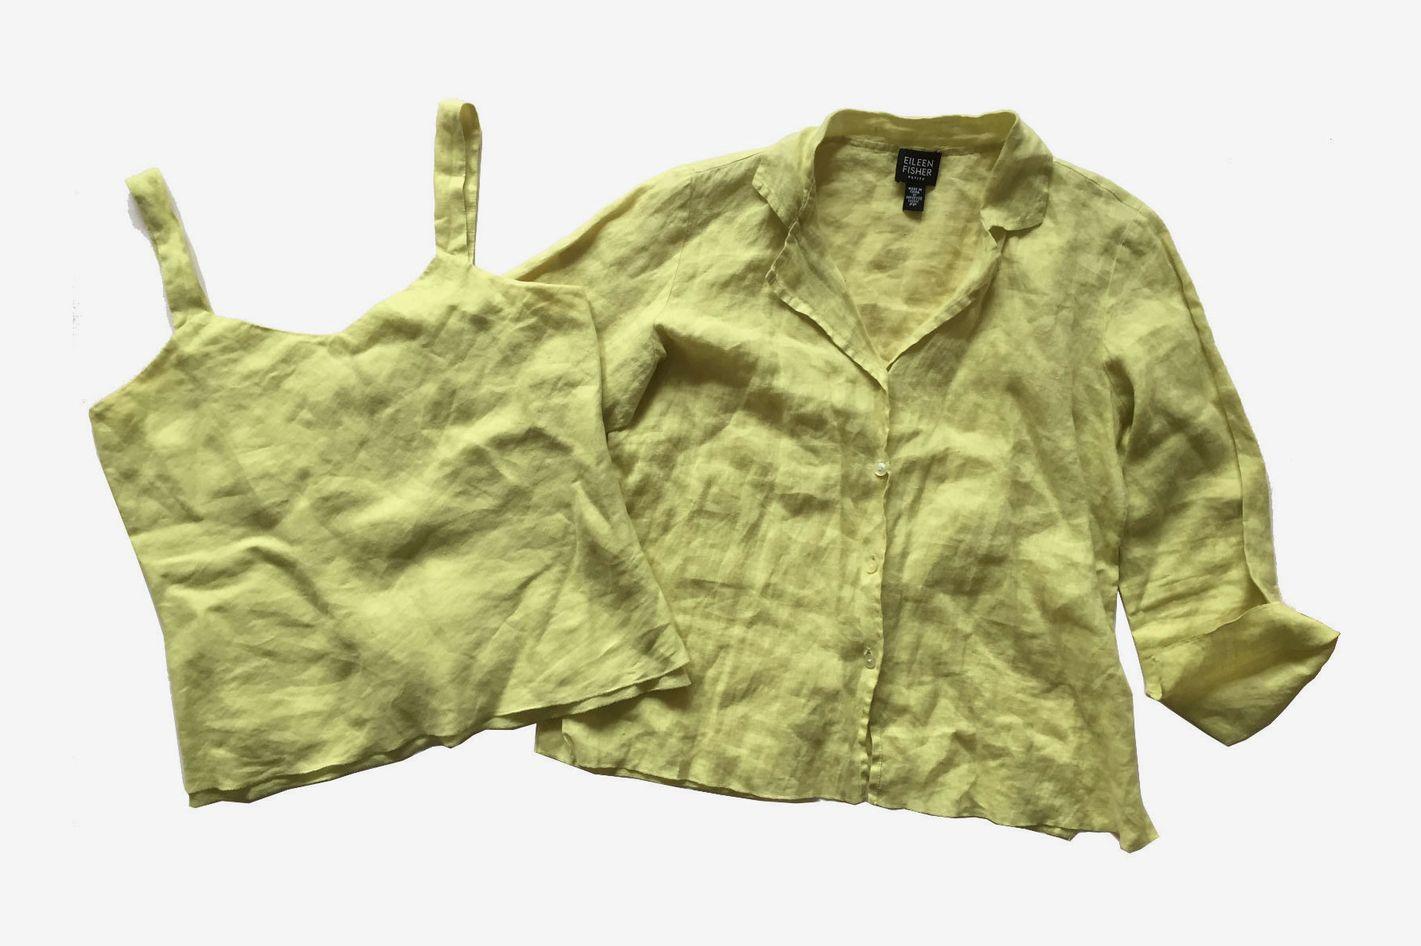 0a17fa419 Eileen Fisher 2-Piece TwinSet Citron Linen Tank and Shirt Set